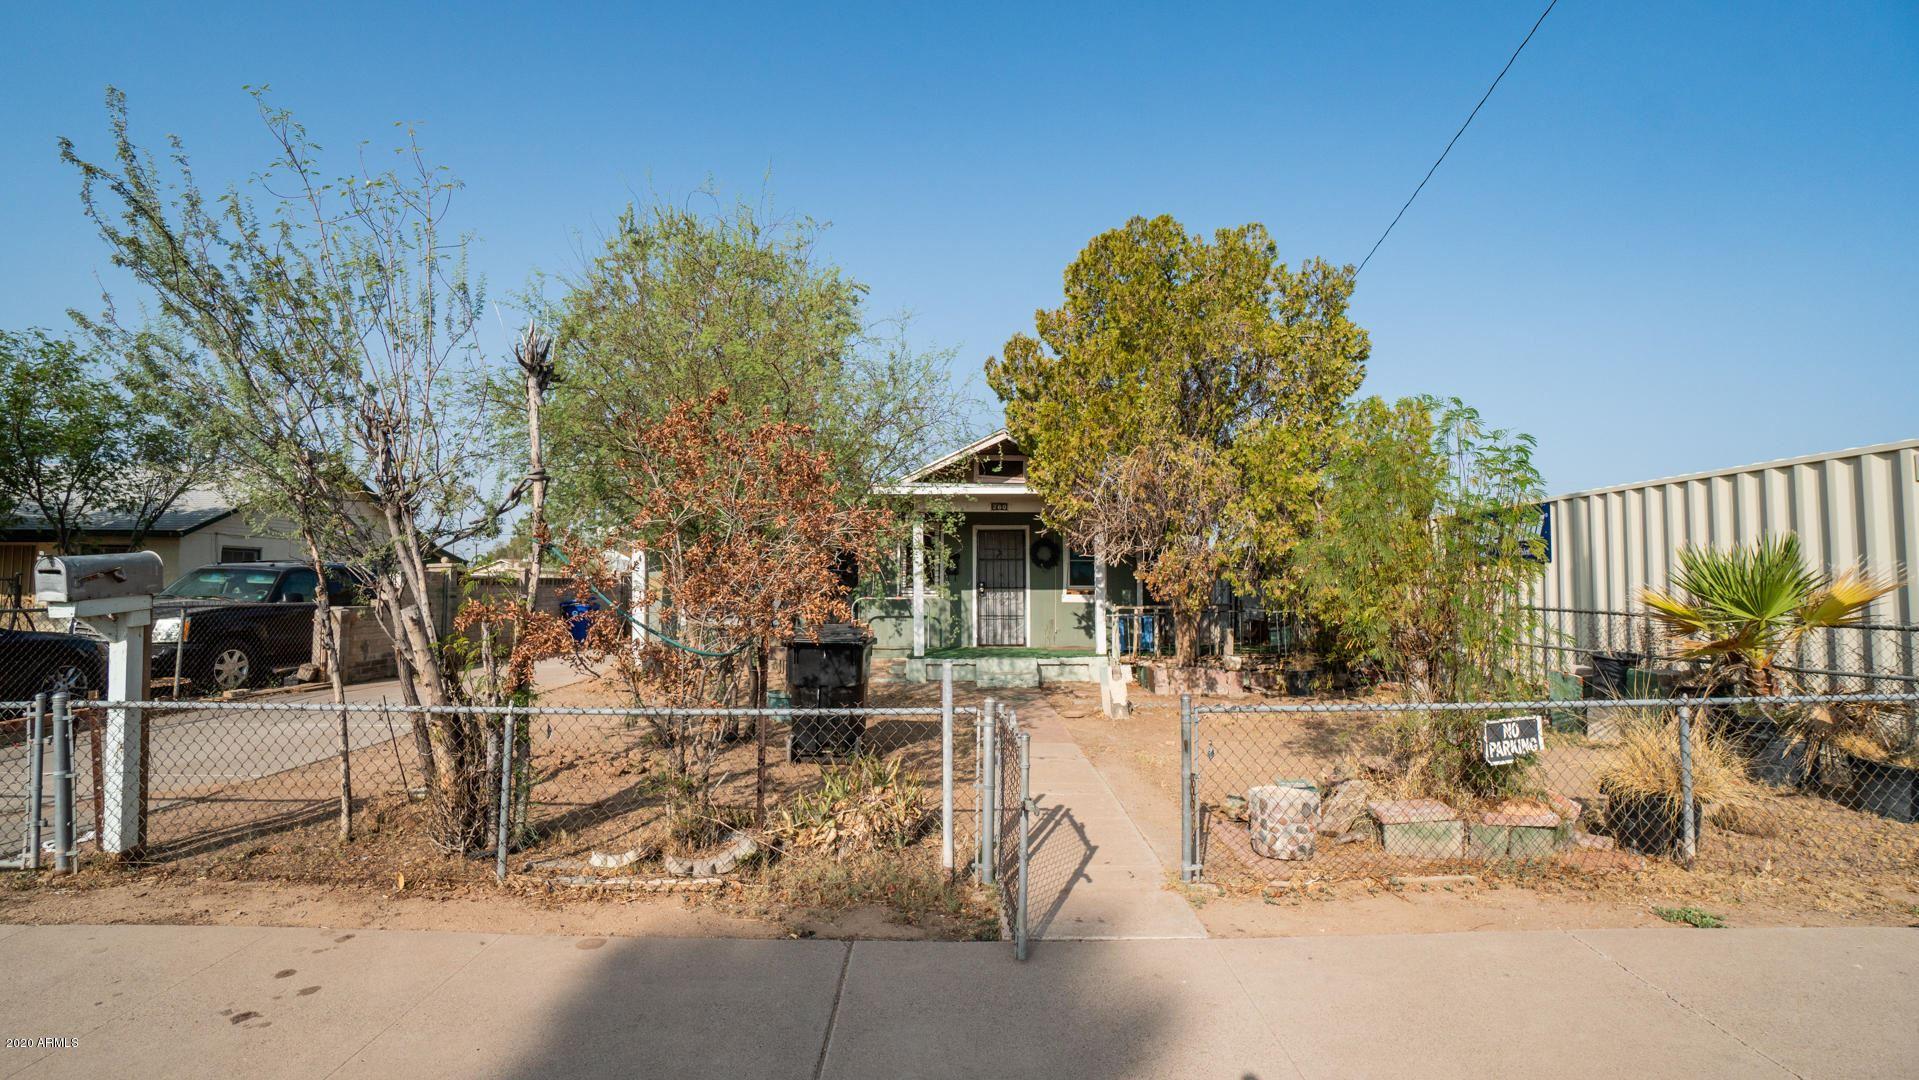 260 S OREGON Street, Chandler, AZ 85225 - MLS#: 6135928